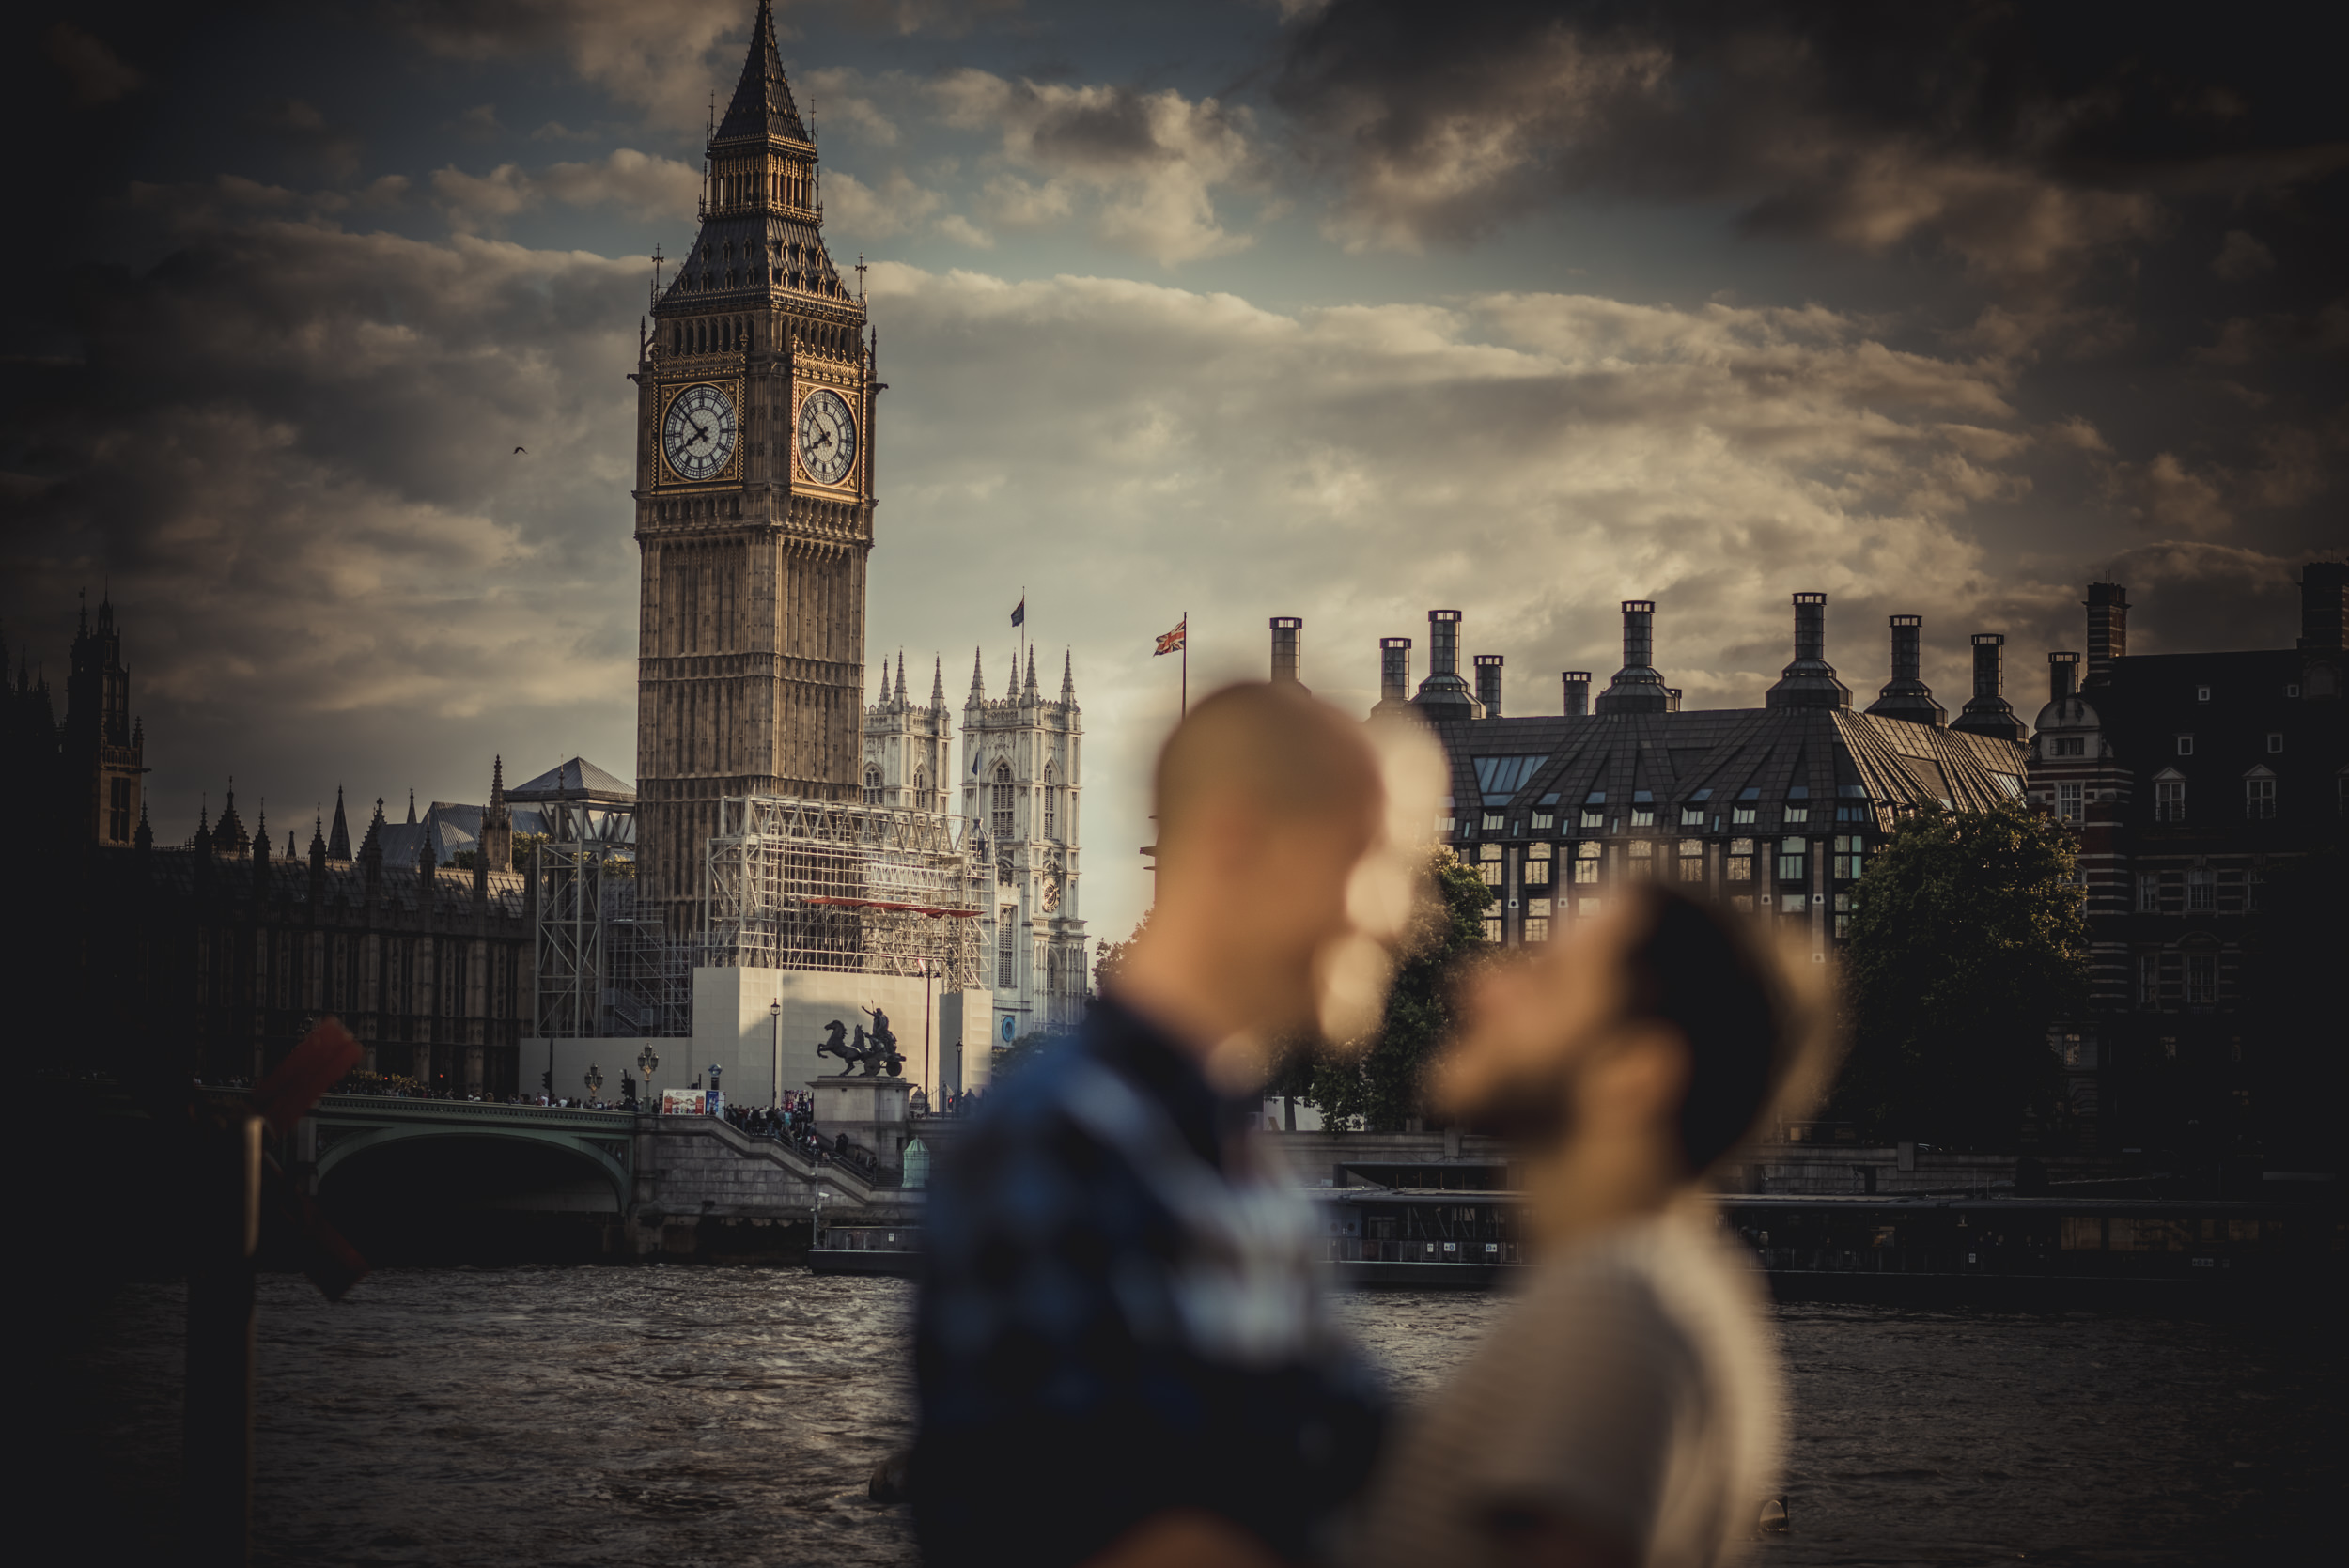 Rhys-and-Alex-engagement-session-london-gay-same-sex-manu-mendoza-wedding-photography-006.jpg